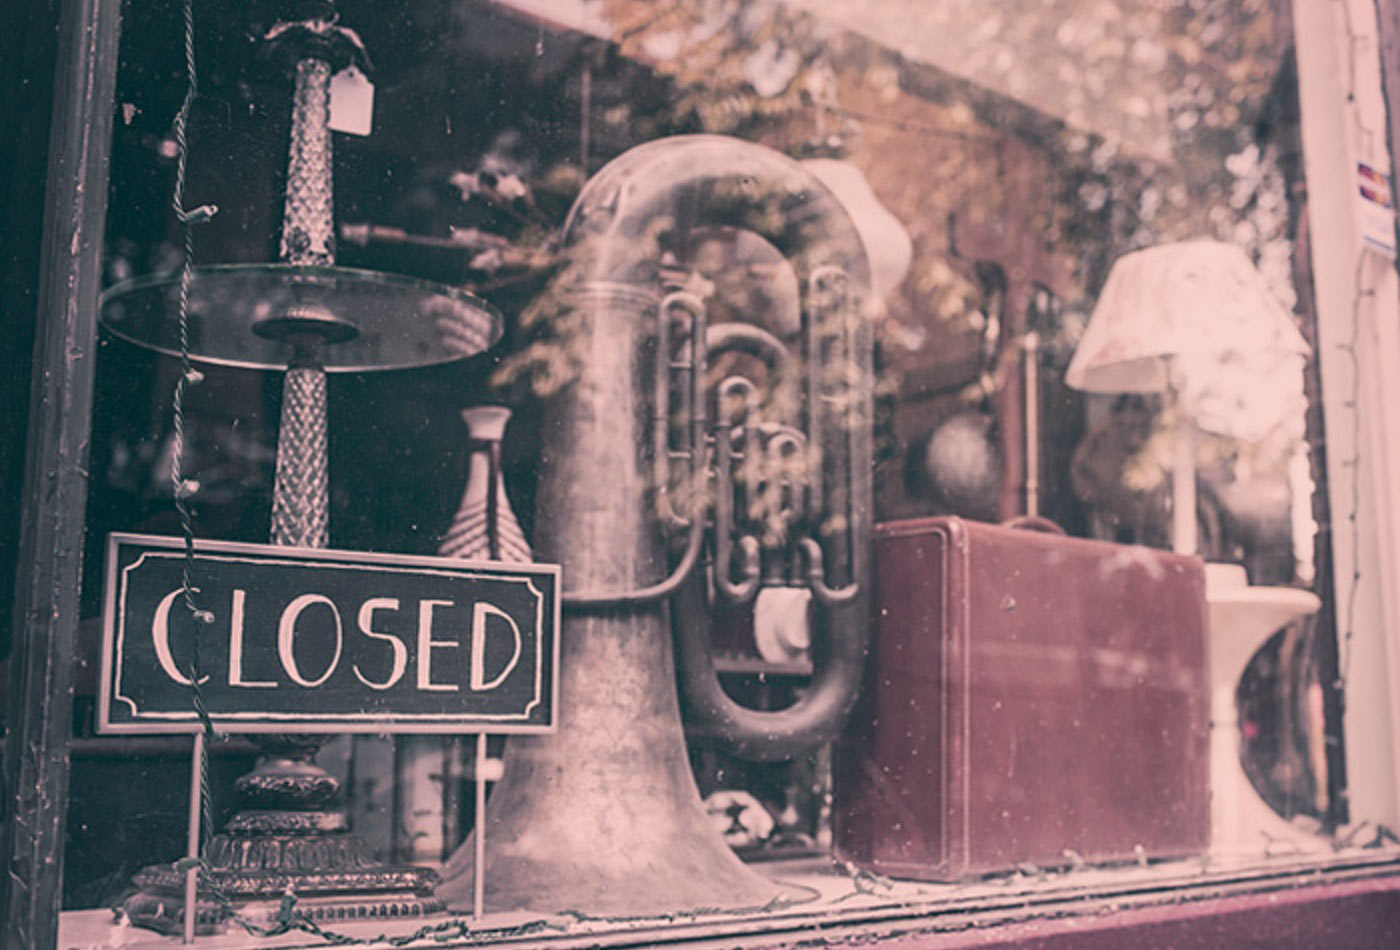 Vintage music shop closed.